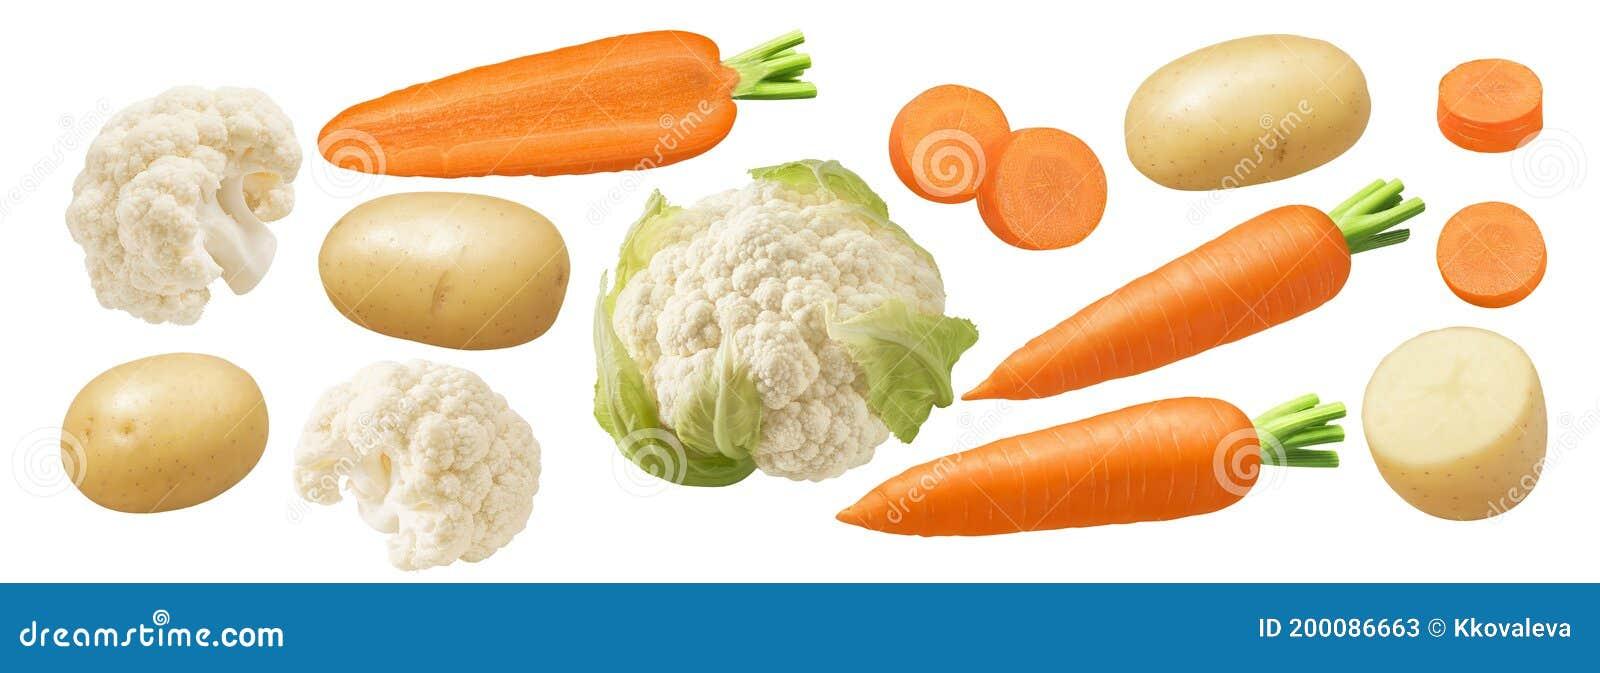 Big Set of Cauliflower, Carrot and Potato Isolated on White ...